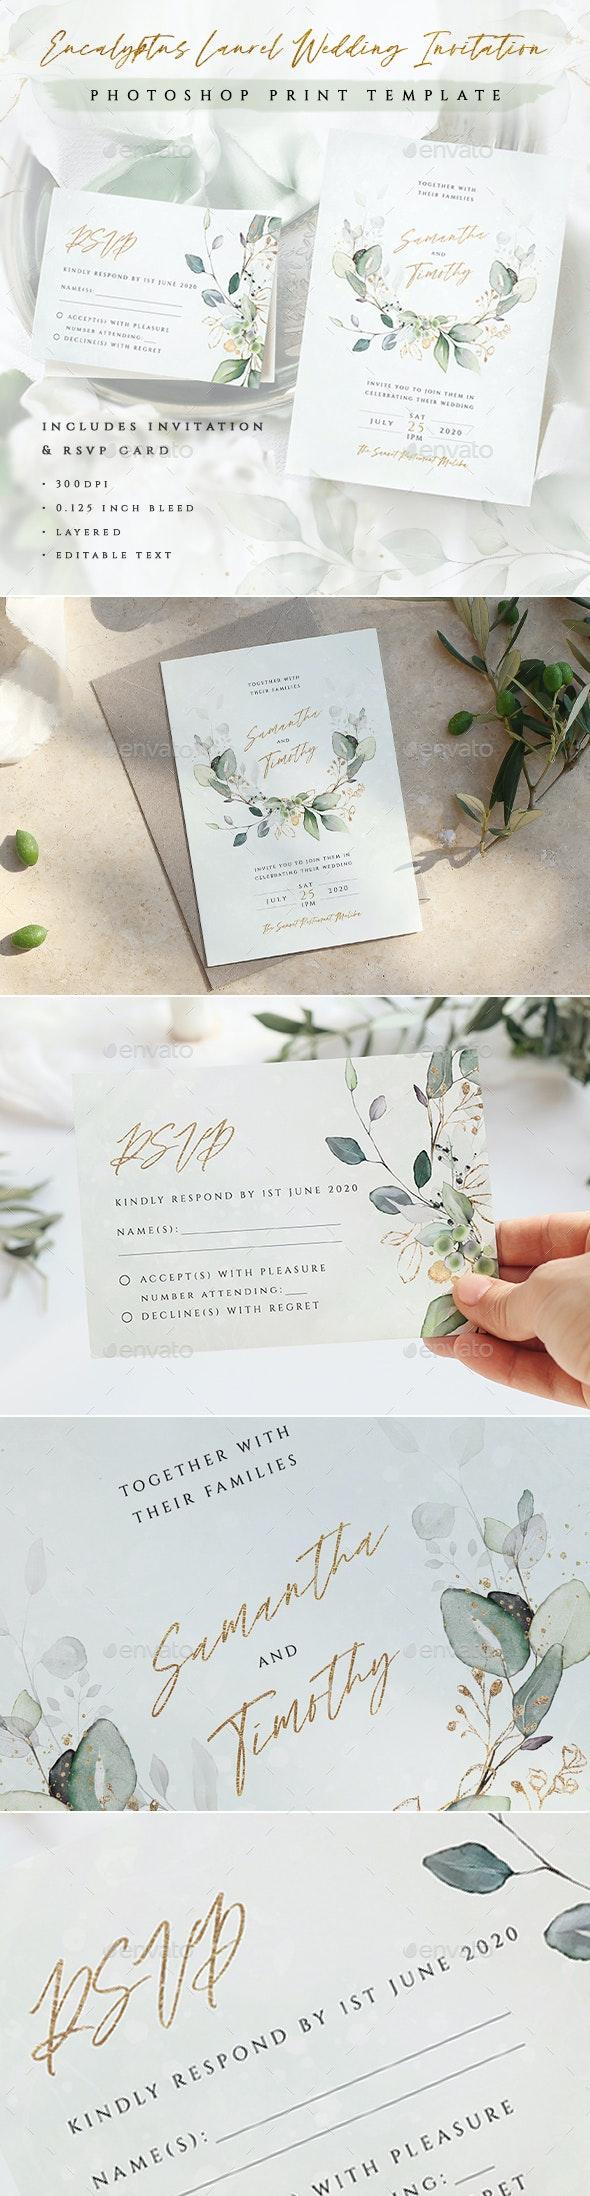 Eucalyptus Laurel Wedding Invitation - Weddings Cards & Invites